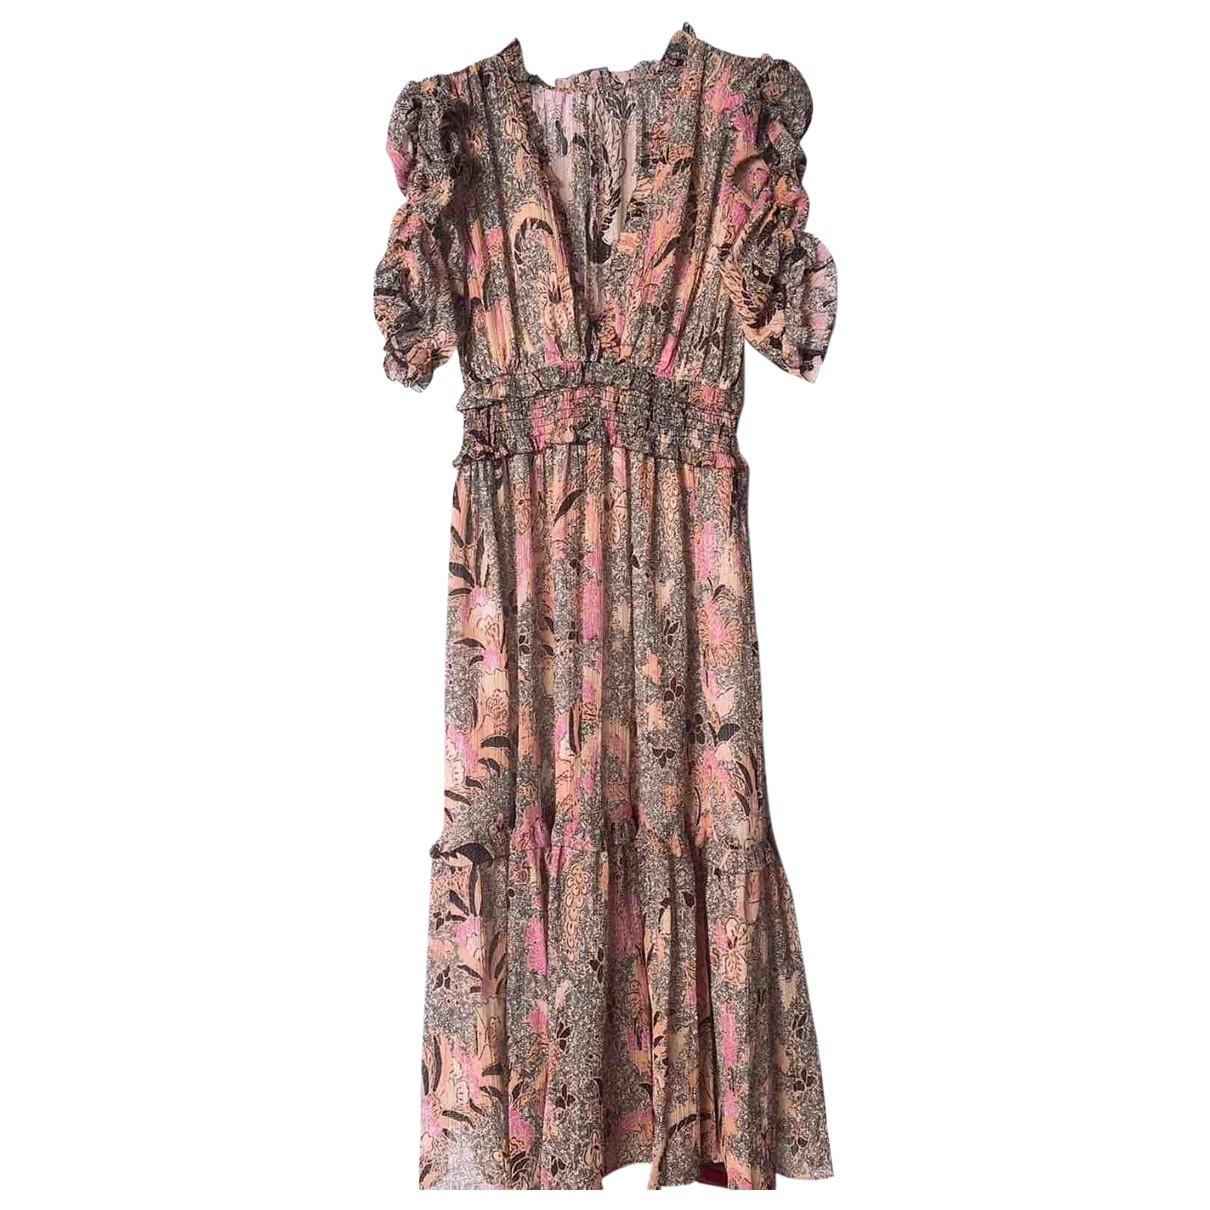 Ulla Johnson \N Pink Silk dress for Women 2 0-5